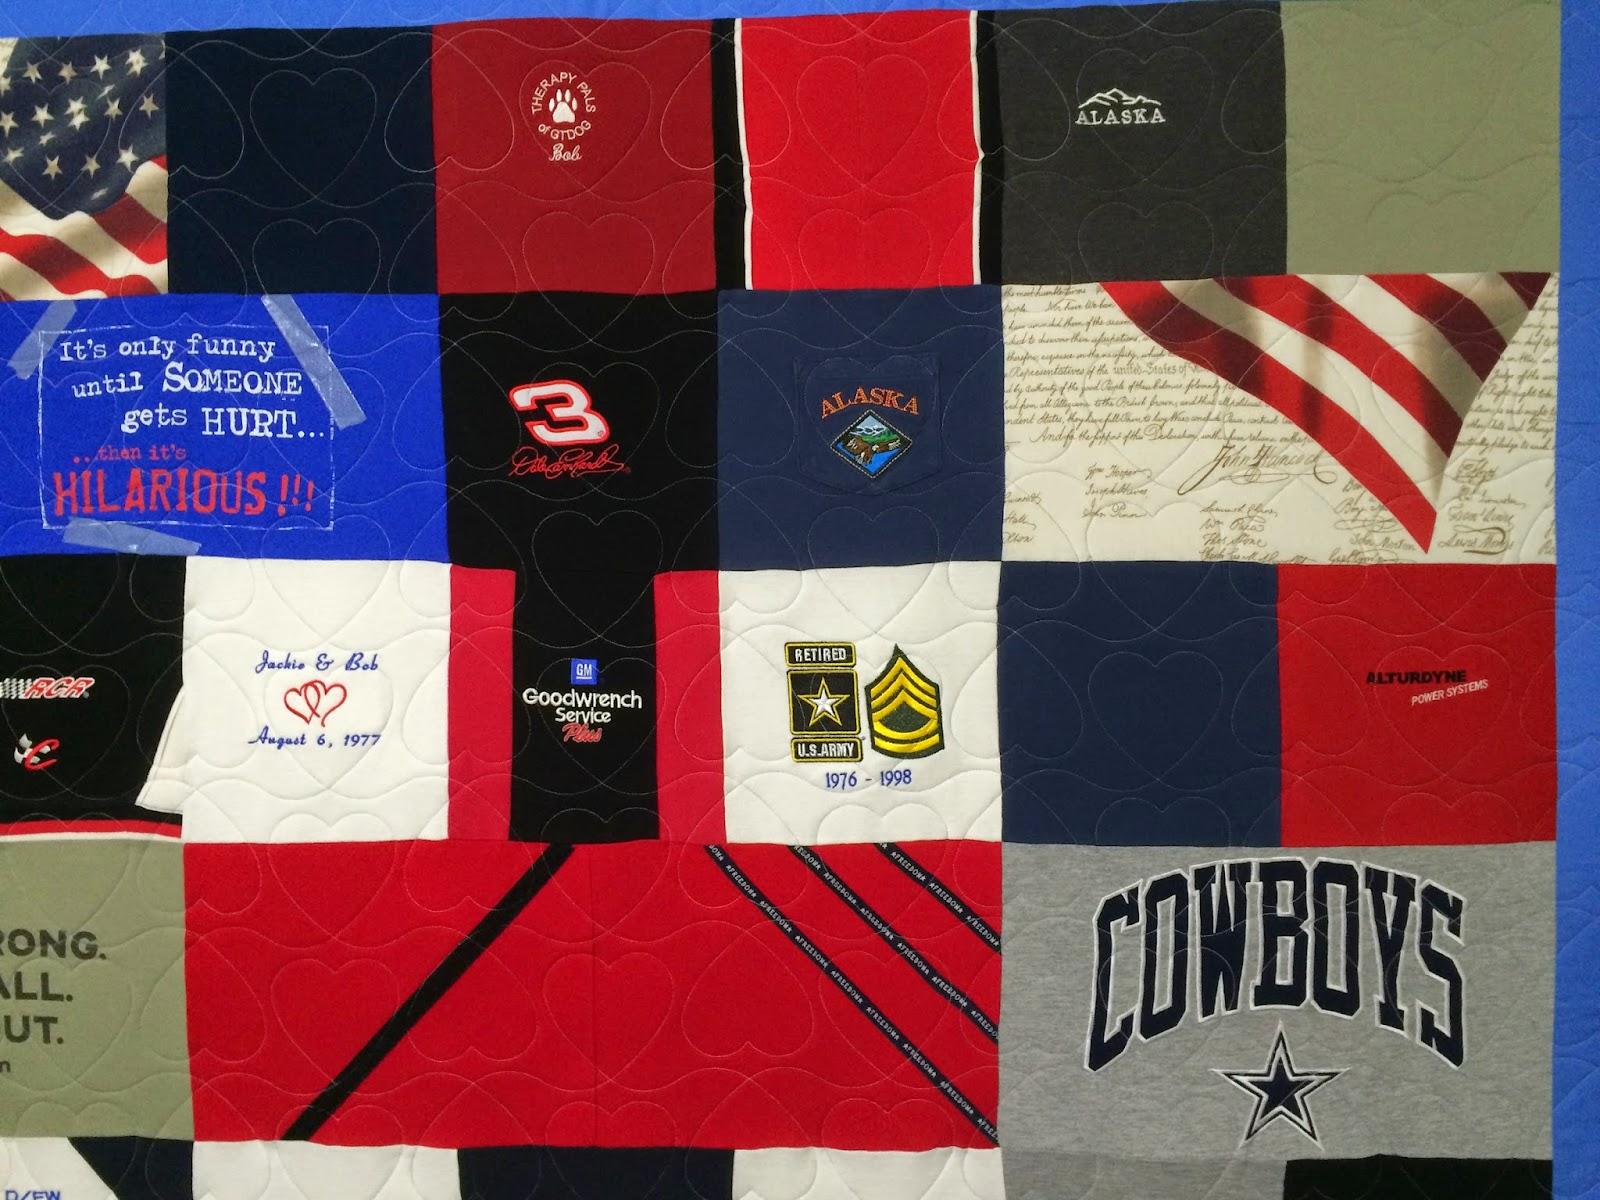 Victoria Huyge's Memorial Quilt